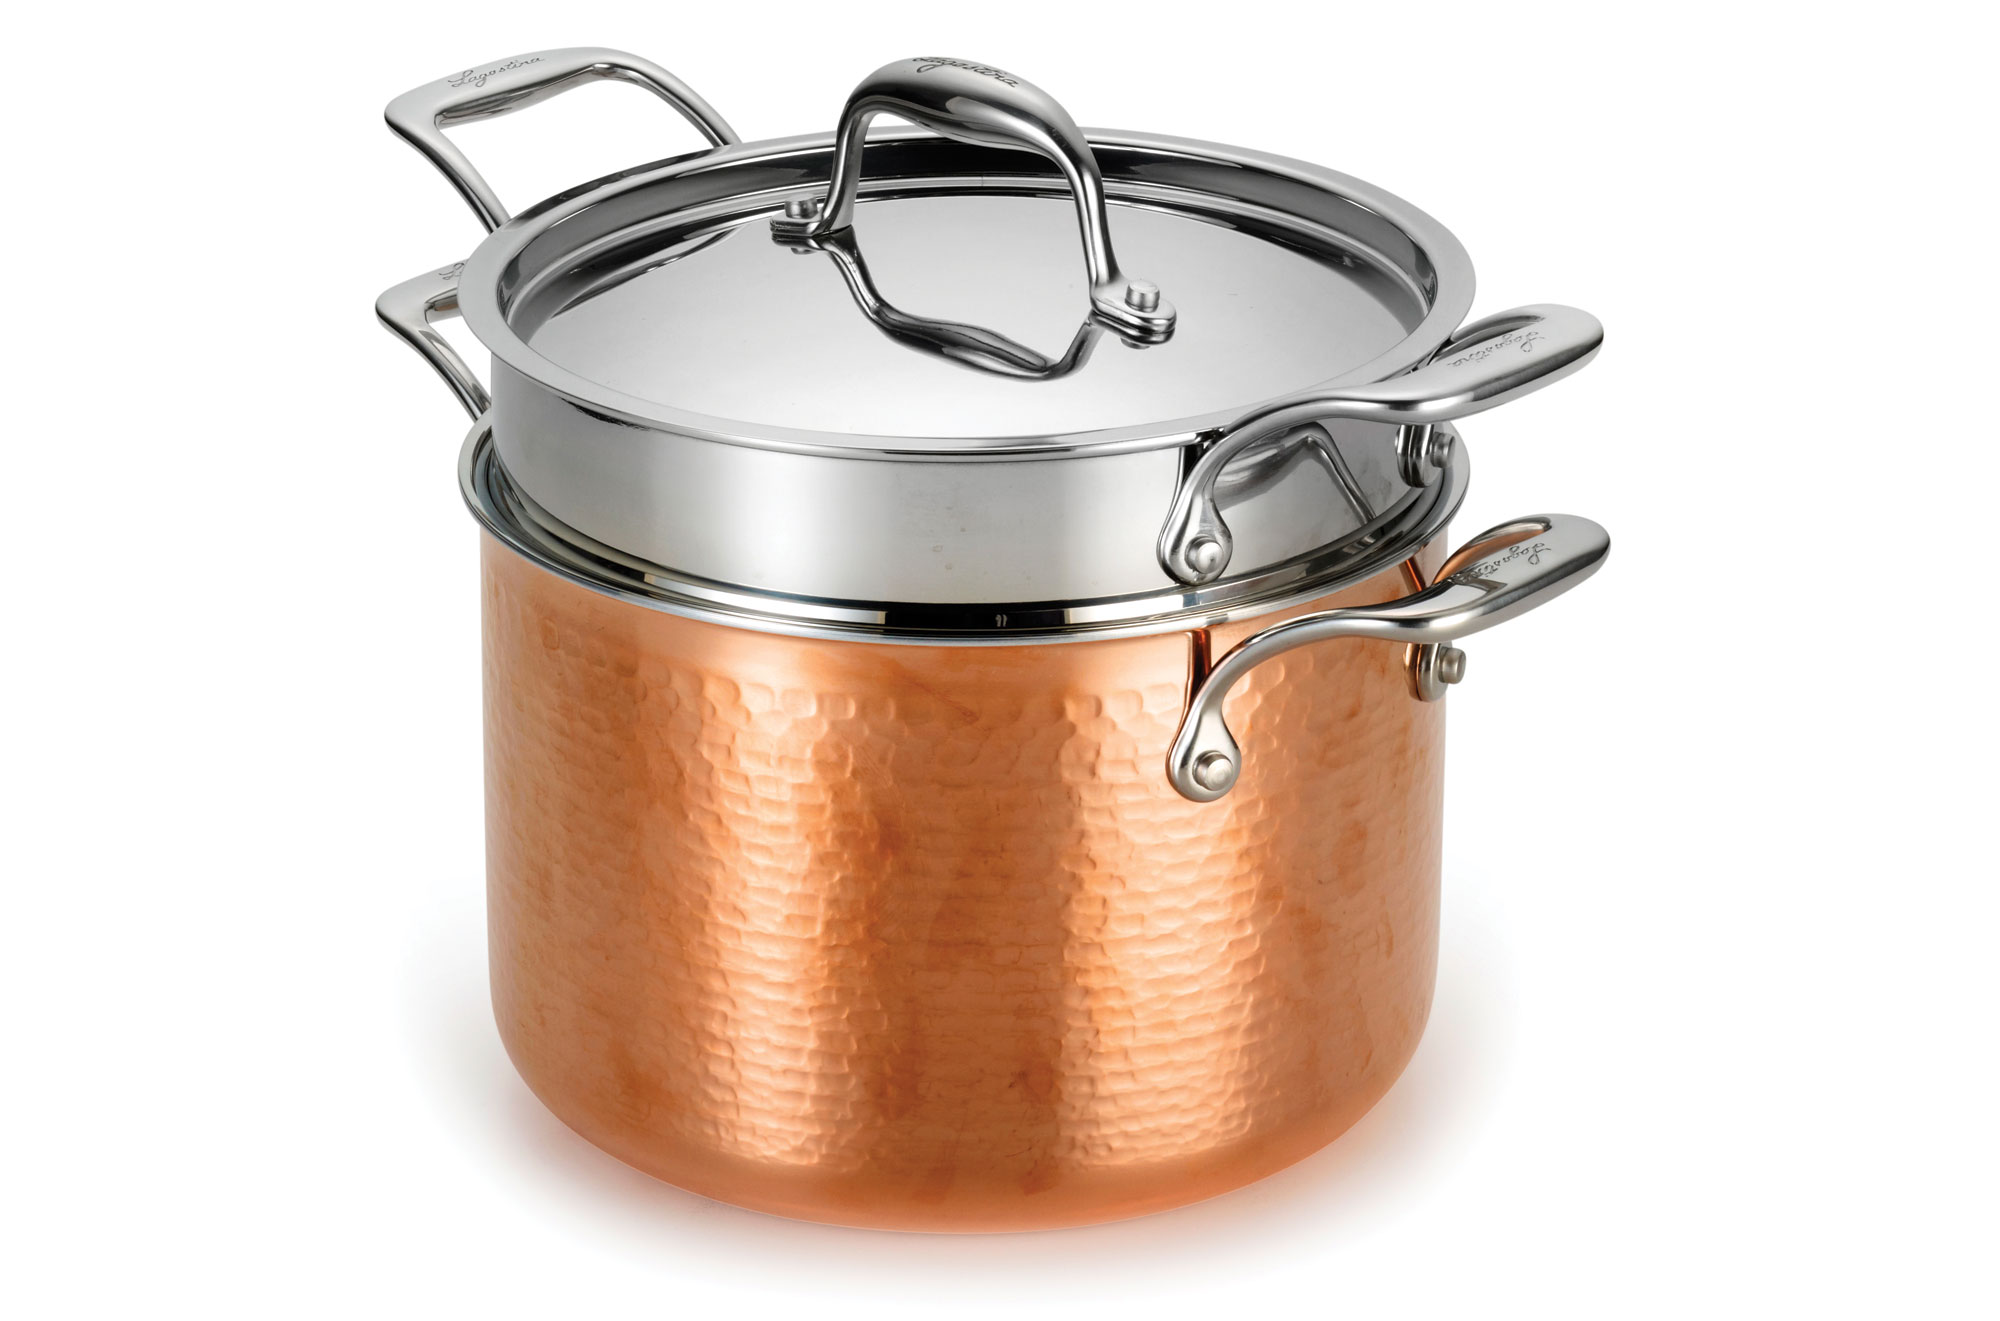 Lagostina Martellata Tri Ply Hammered Copper Pastaiola 6